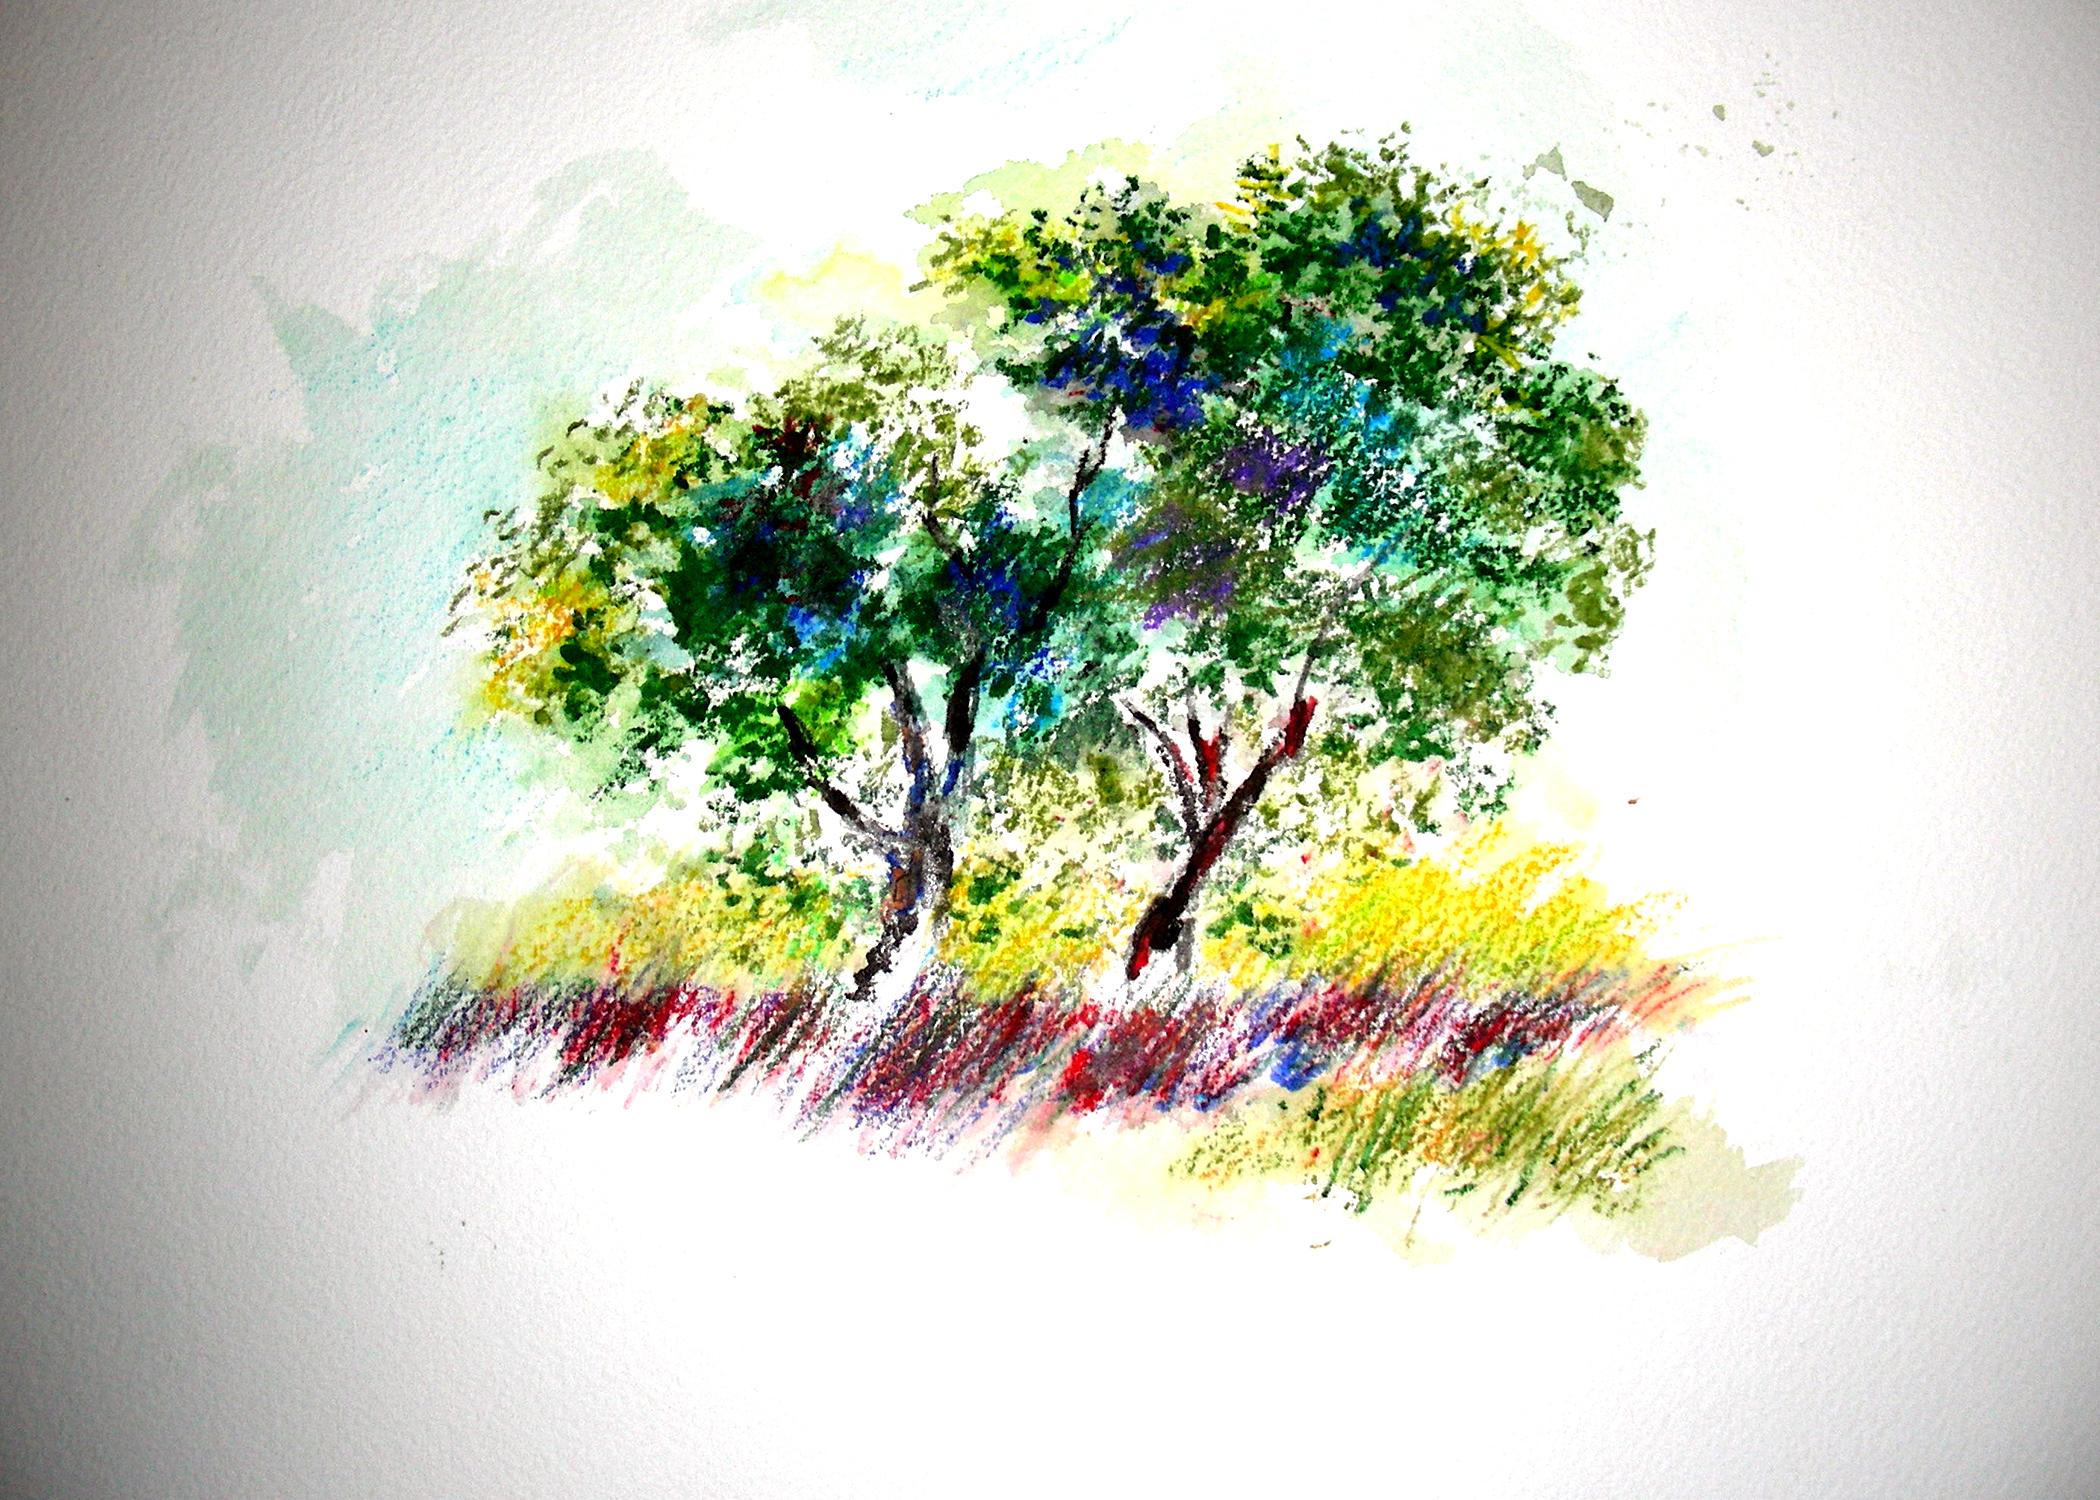 prismacolor watercolor pencils | Recollections 54 The Art ...